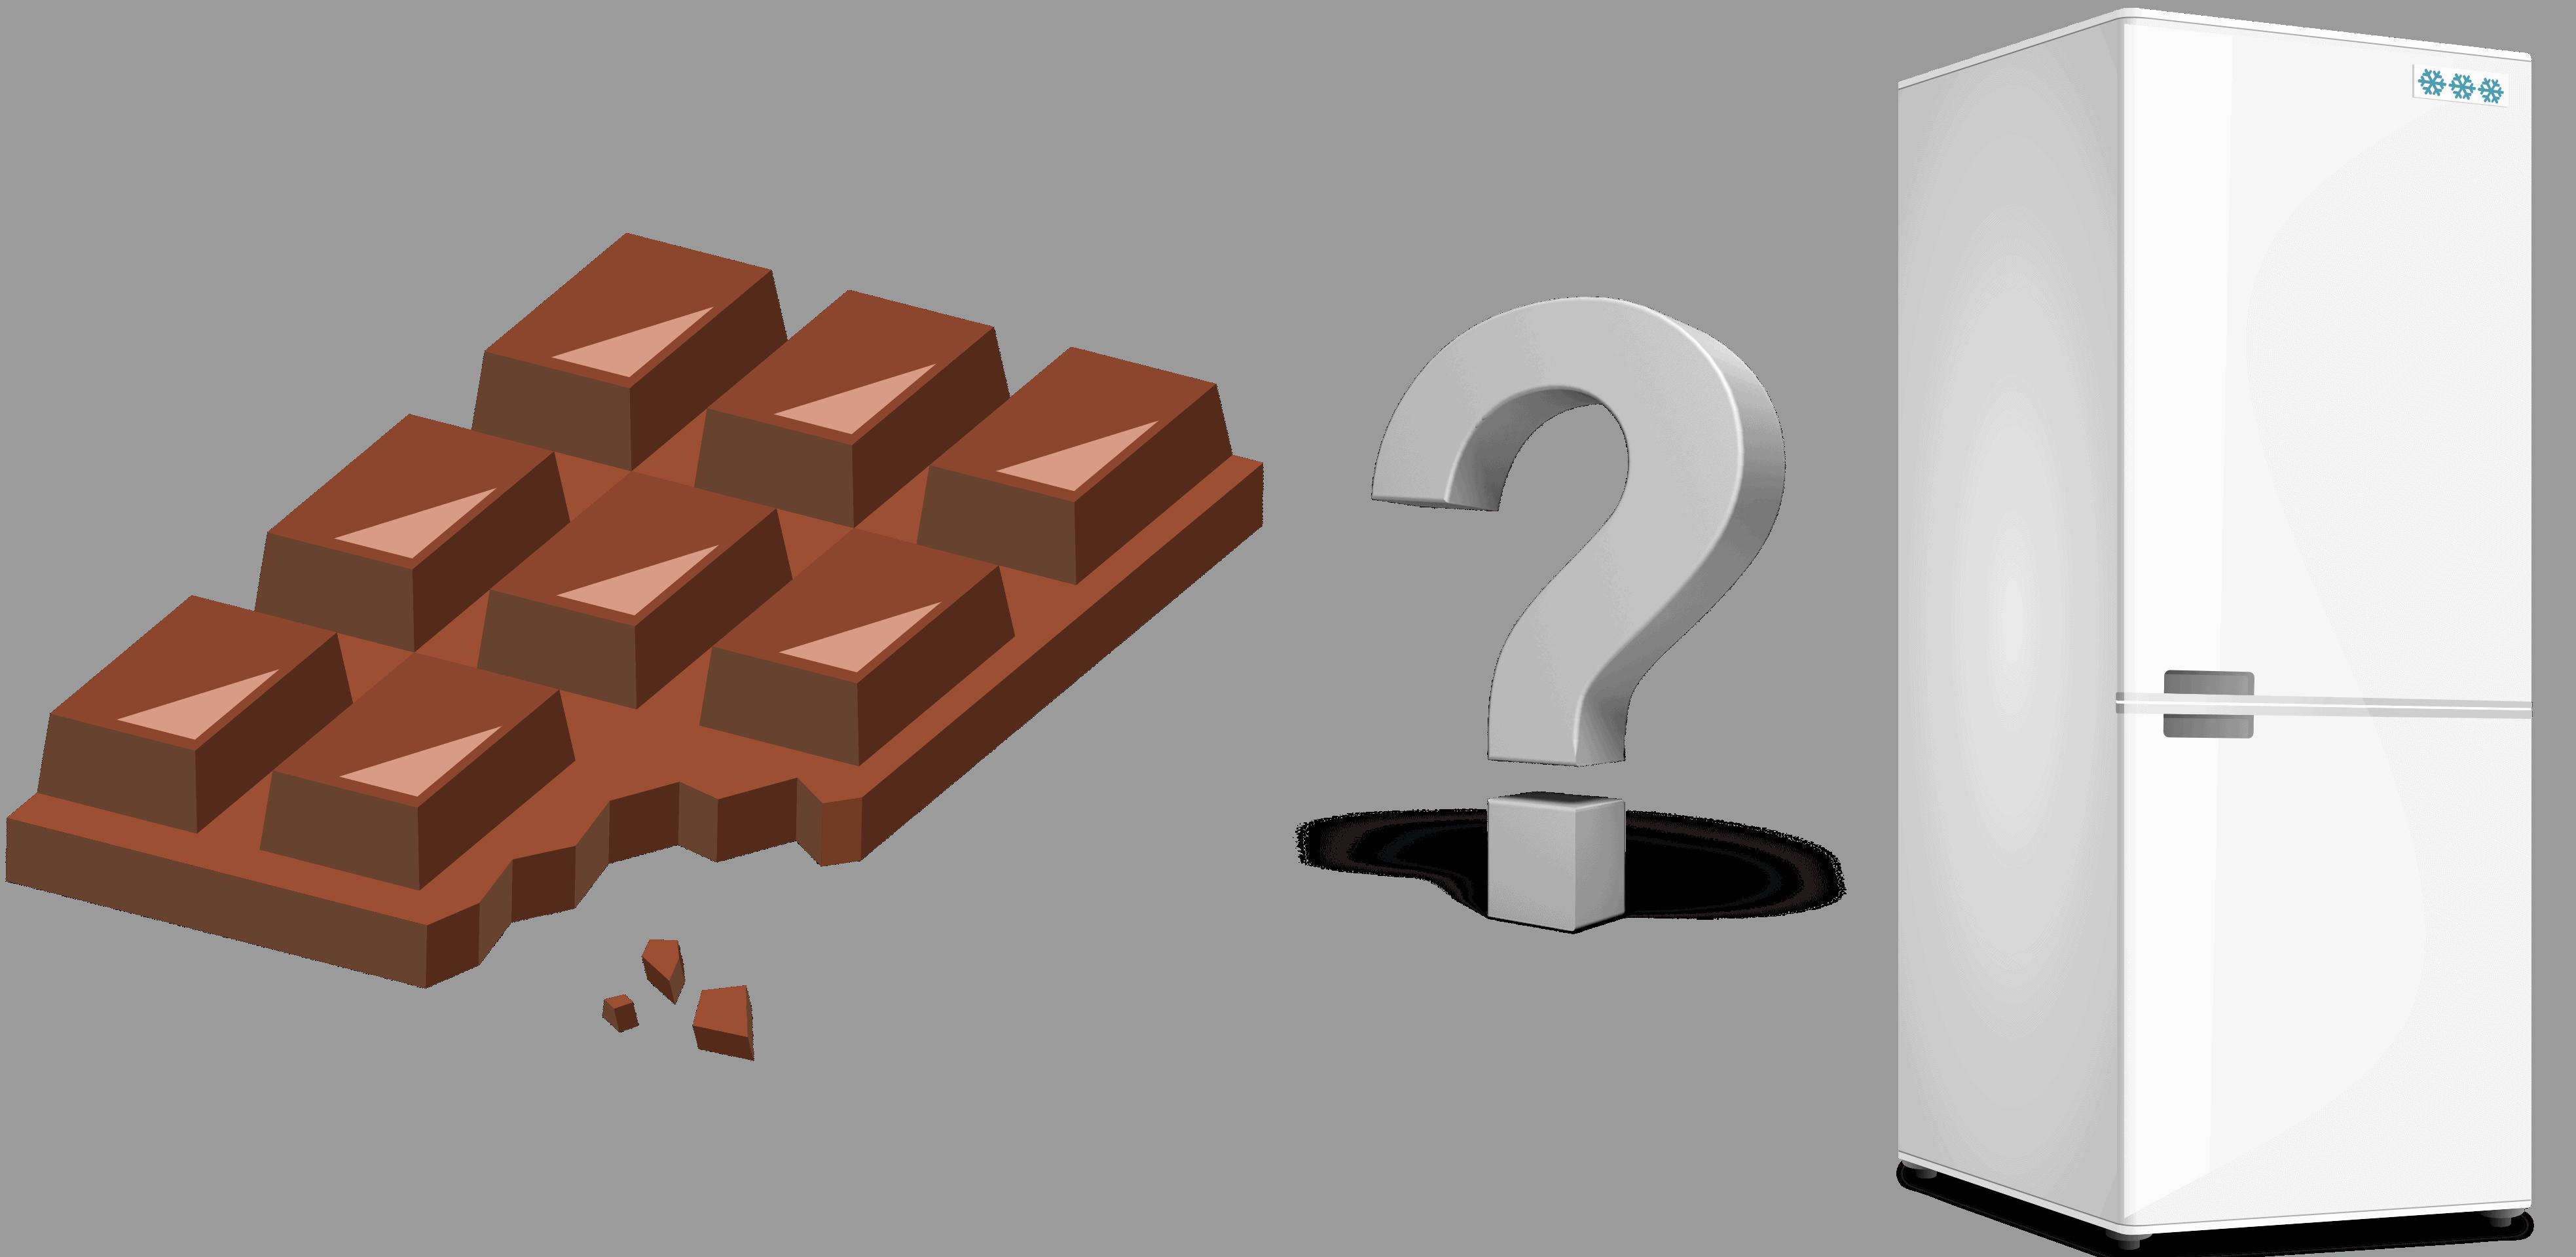 Kuehlschrank-Schokolade